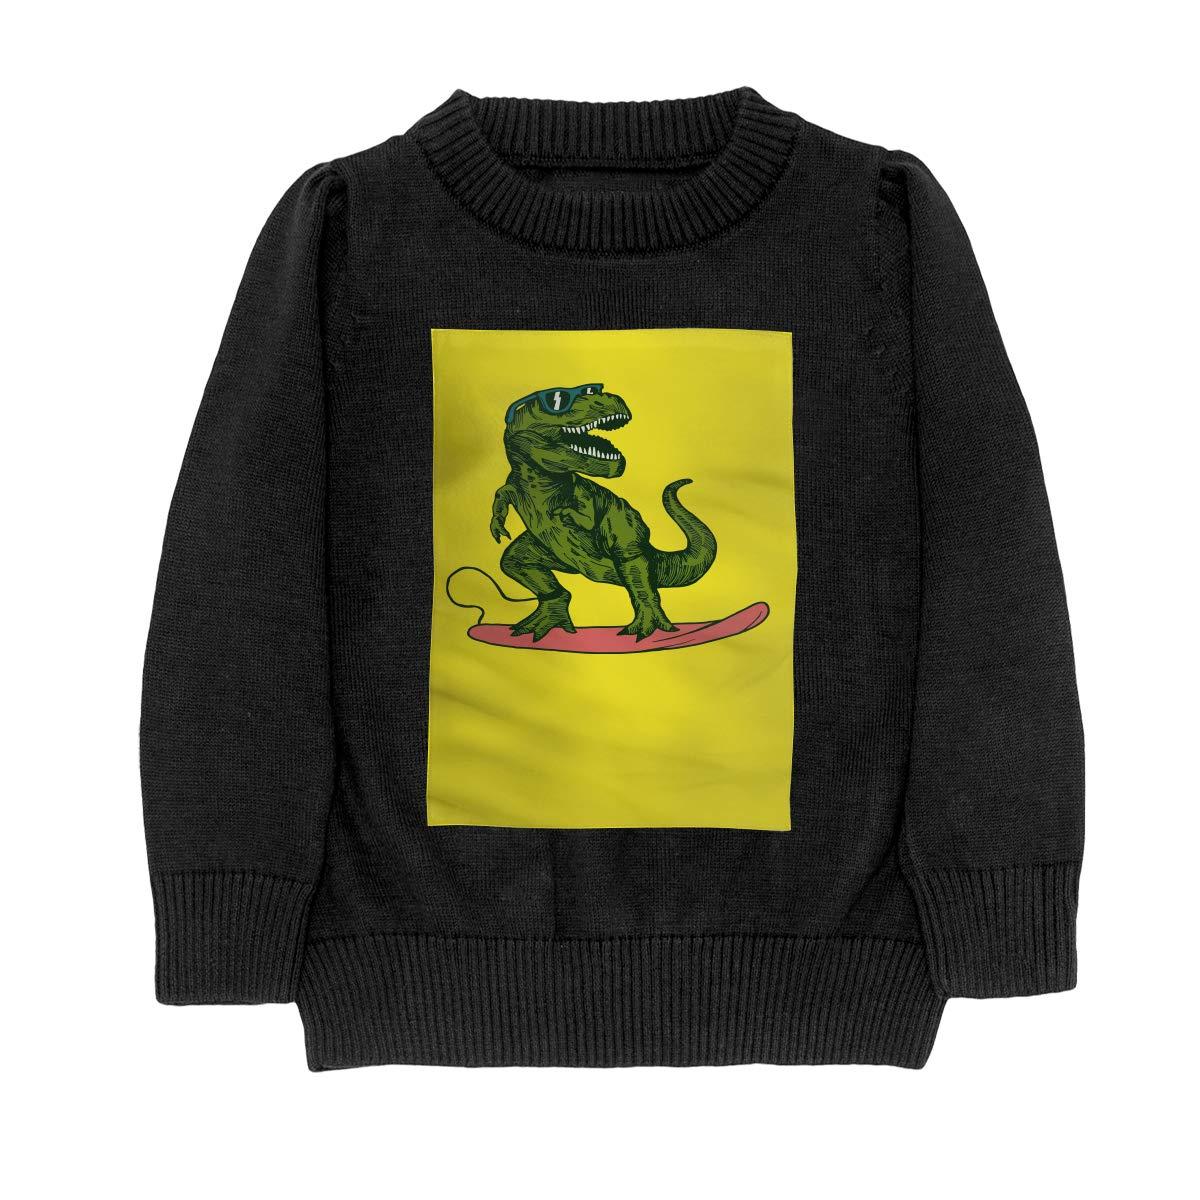 WWTBBJ-B Happy Dinosaur Surfer Wearing Sunglasses Style Adolescent Boys /& Girls Unisex Sweater Keep Warm